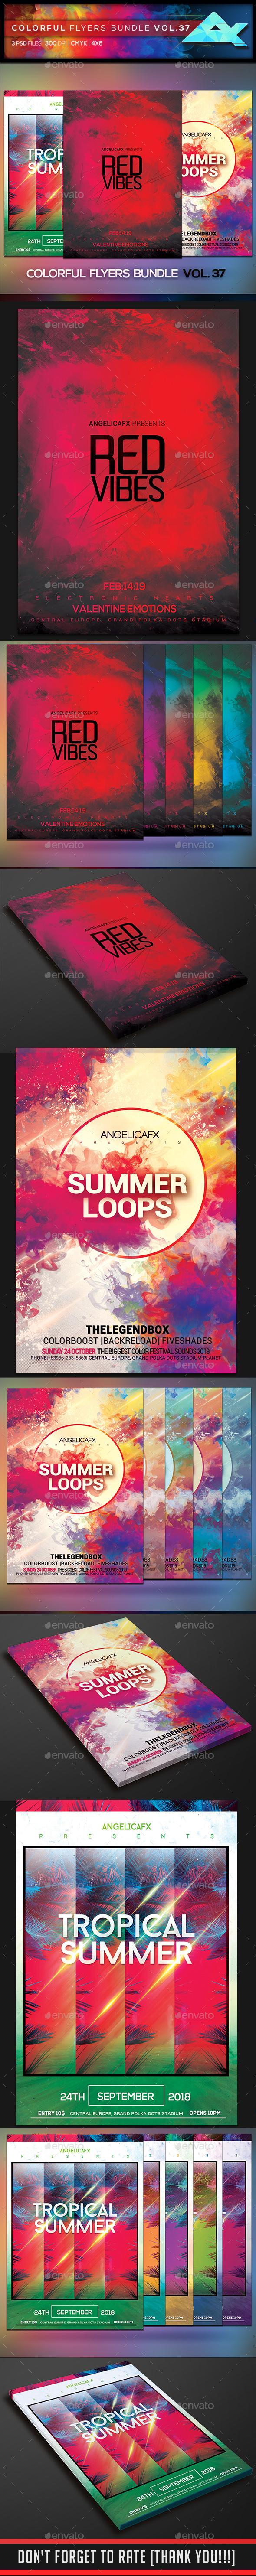 Colorful Flyers Bundle Vol. 37 - Clubs & Parties Events